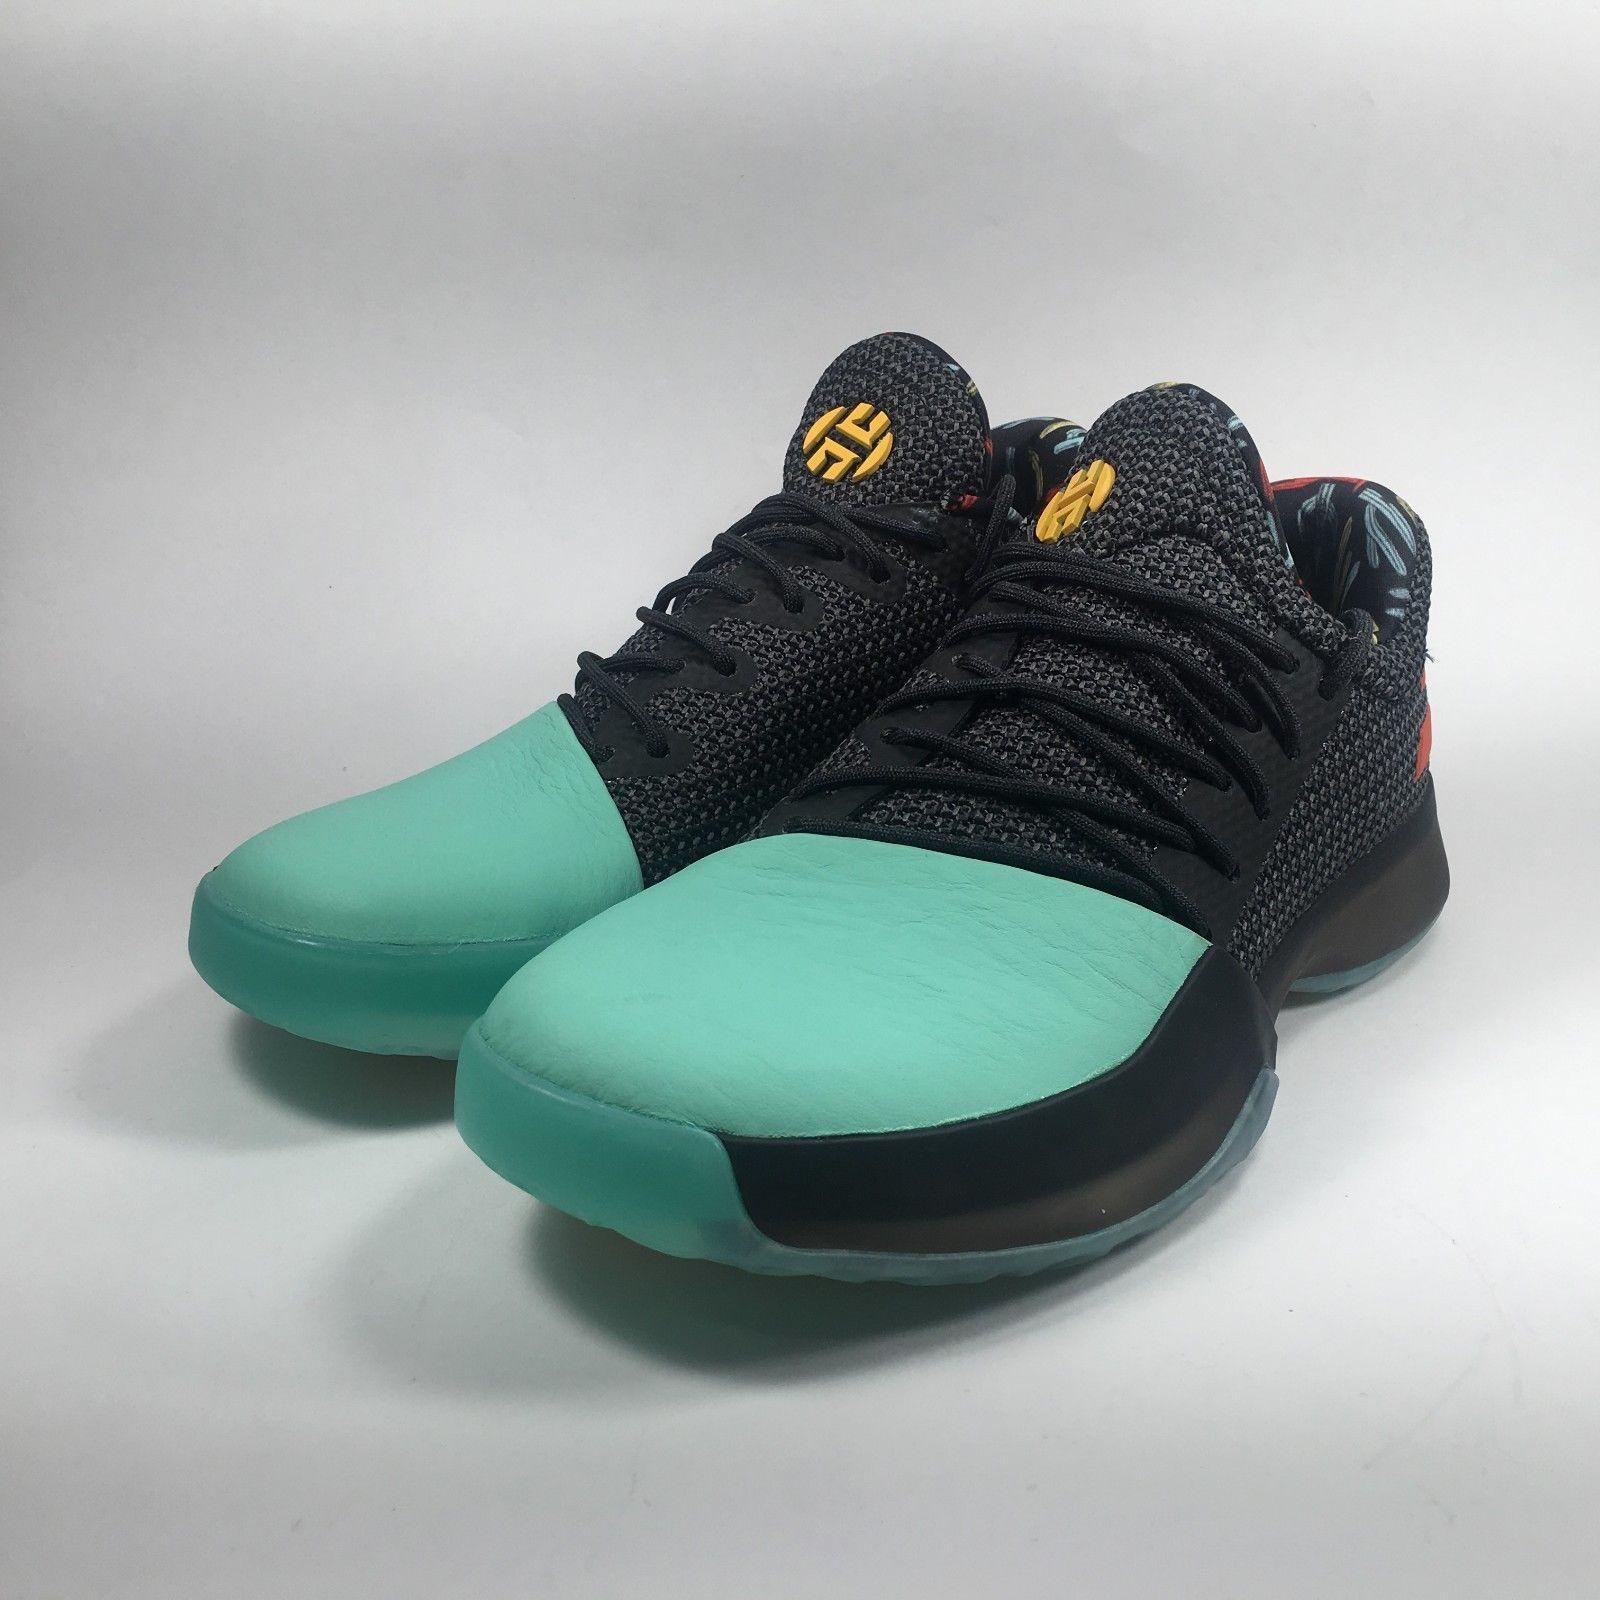 New Adidas James Harden Vol 1 Cactus